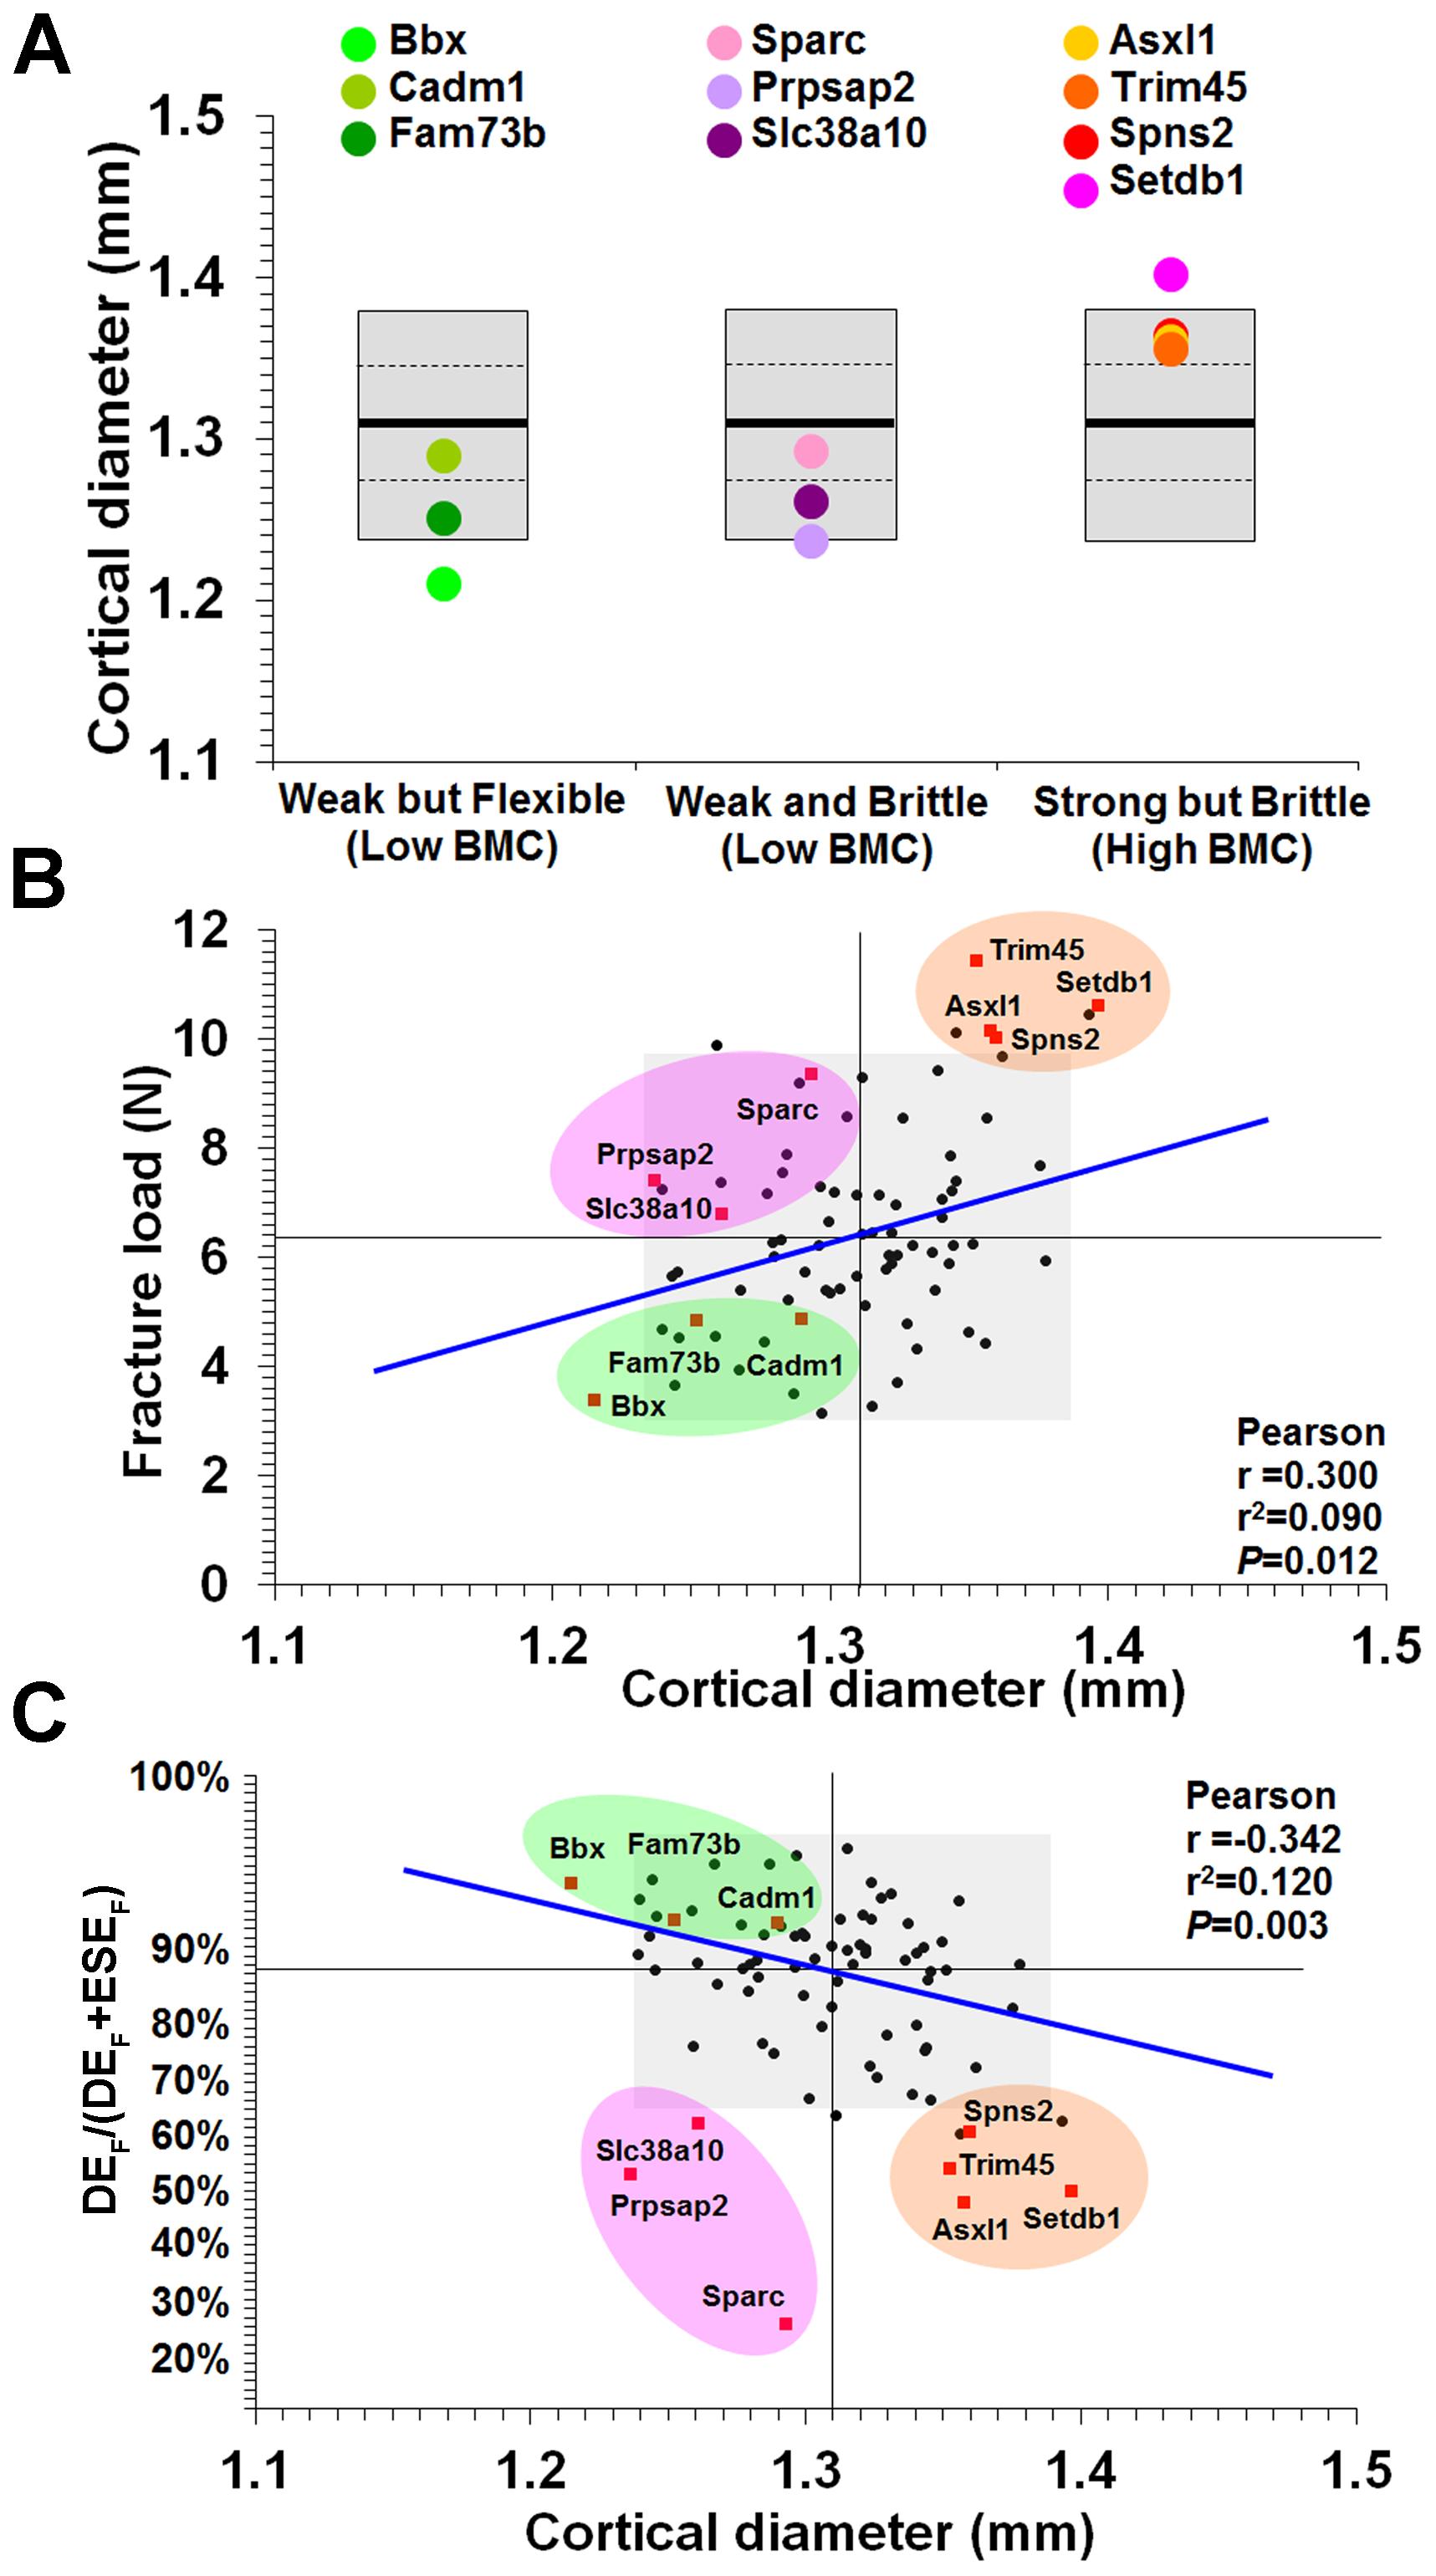 Relationship between mid-diaphyseal cortical bone diameter and strength.